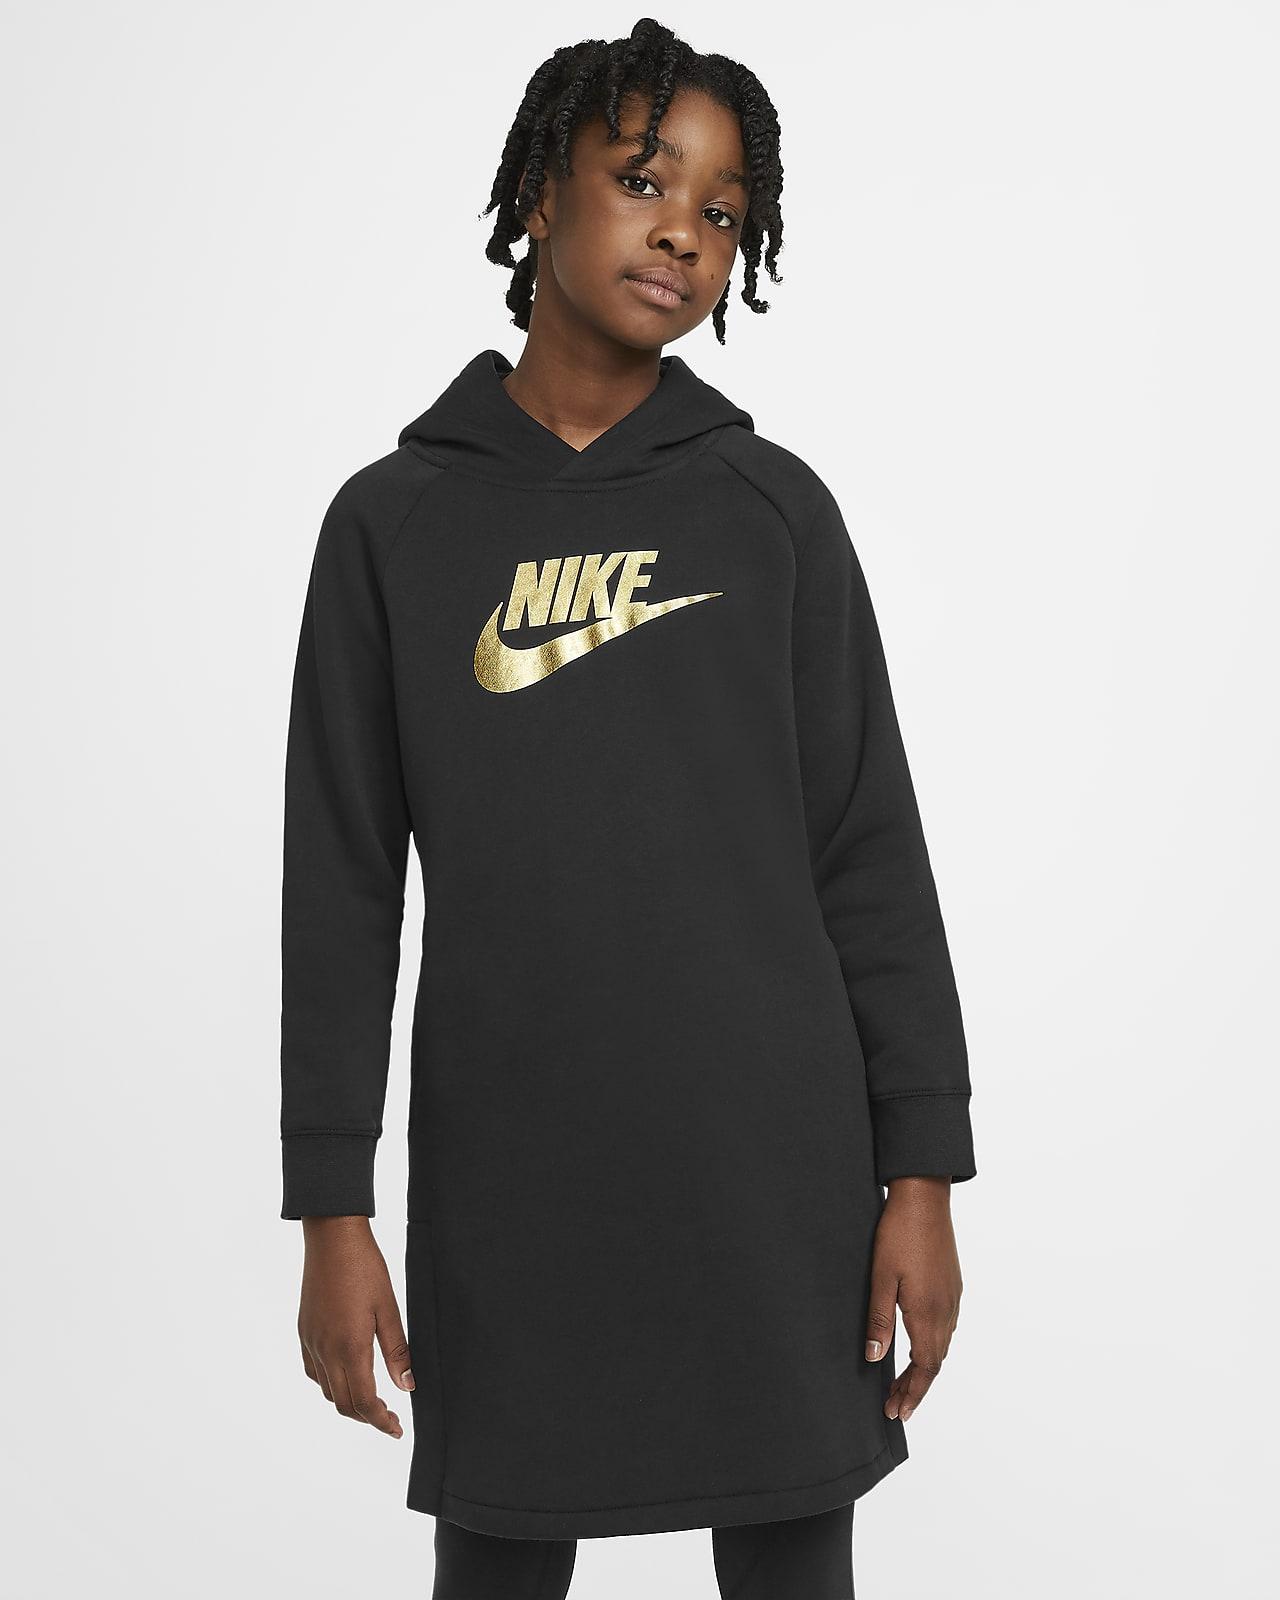 Robe à capuche Nike Sportswear pour Fille plus âgée